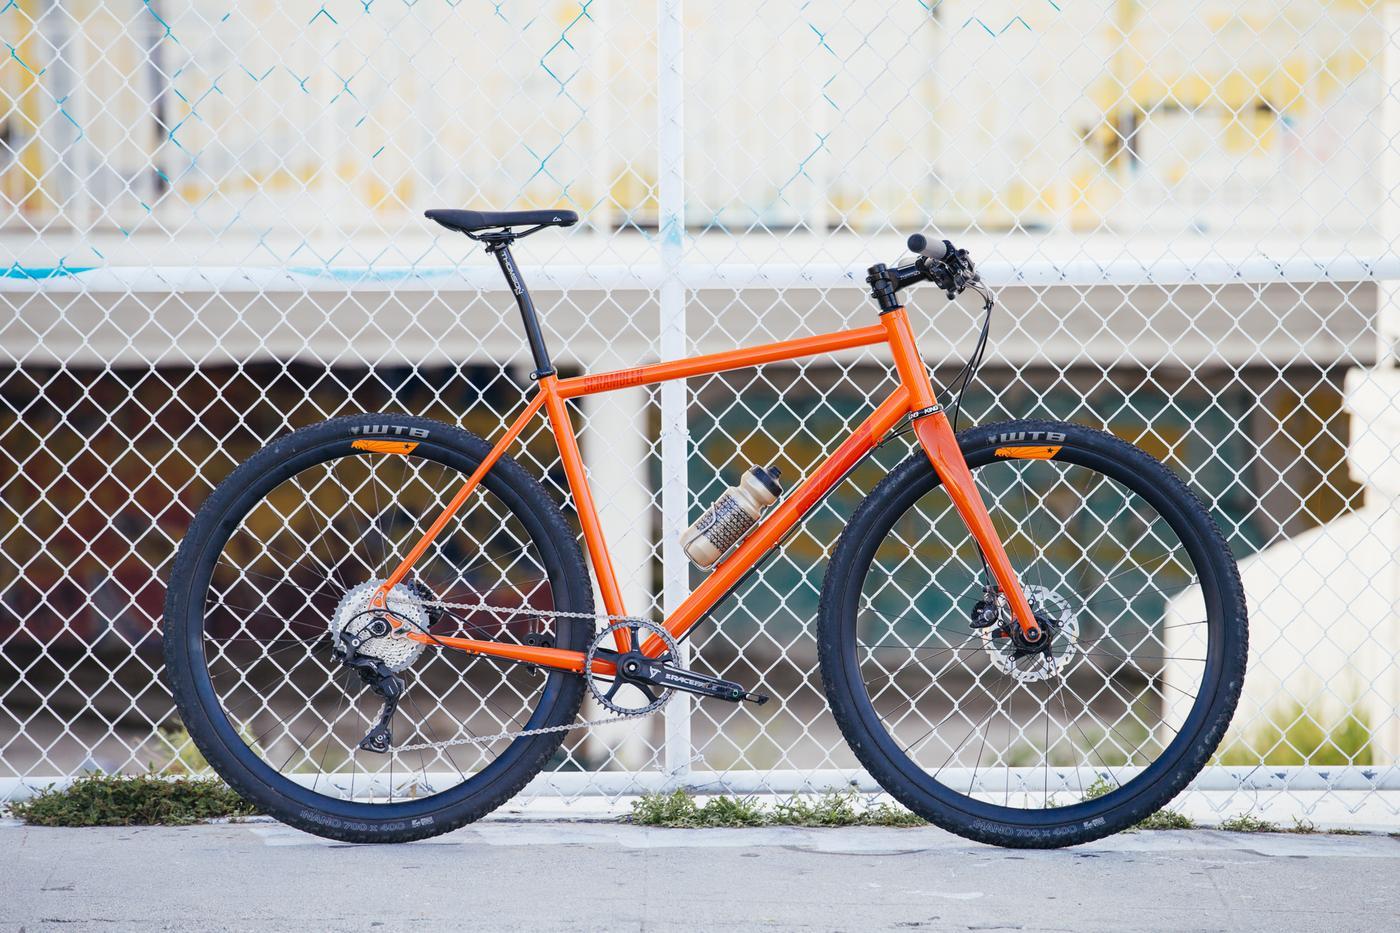 Caletti-Scrambler-Flat-Bar-Cross-Bike-1.